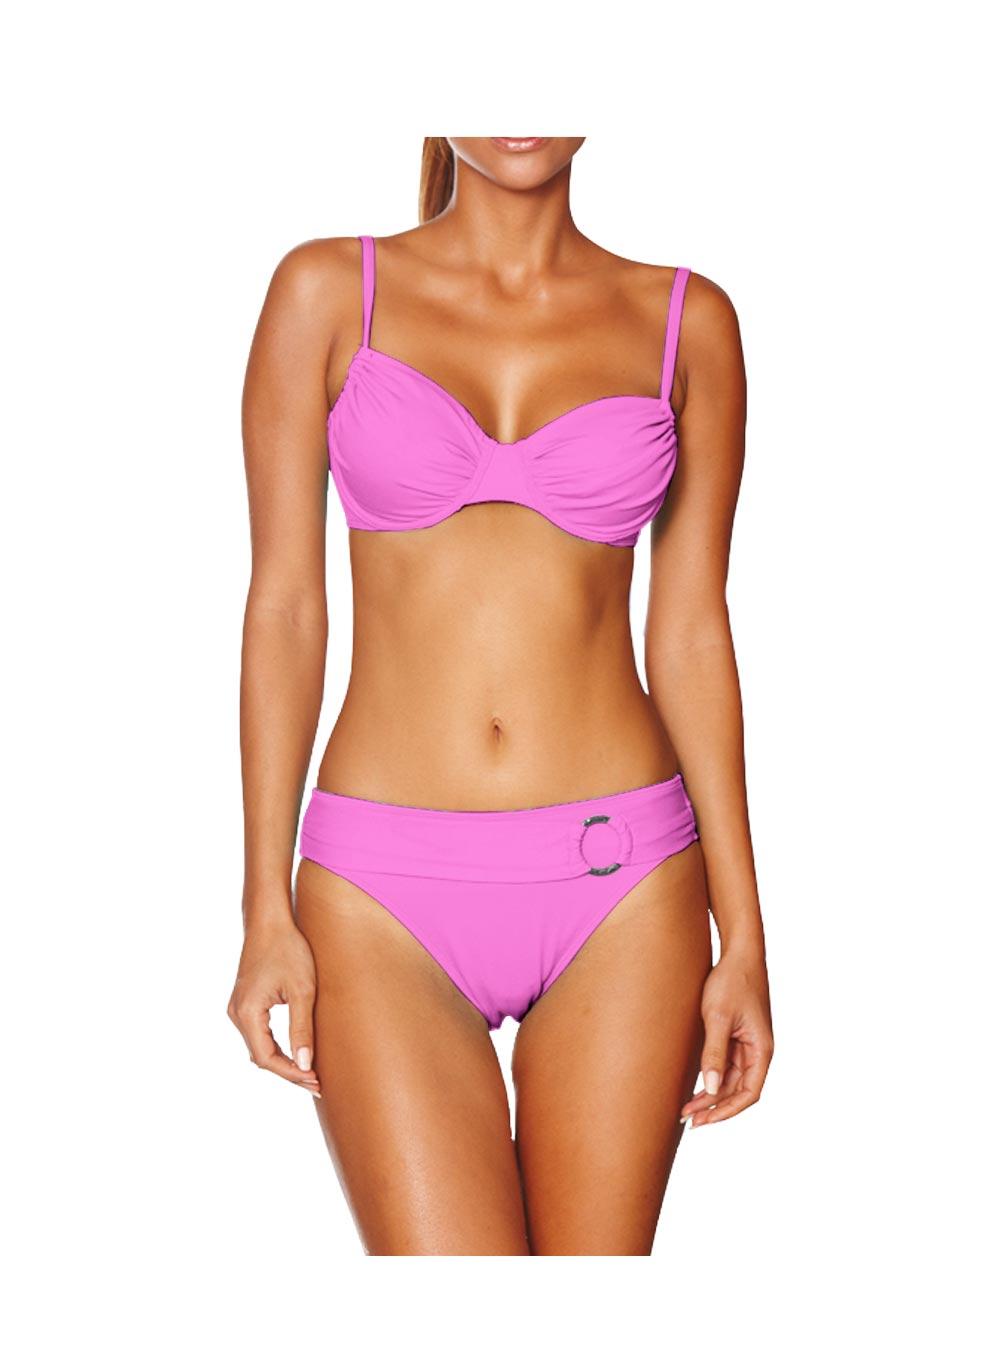 marken b gel bikini rosa cup c d gr 34 36 38 40 42 44 46 uvp ebay. Black Bedroom Furniture Sets. Home Design Ideas